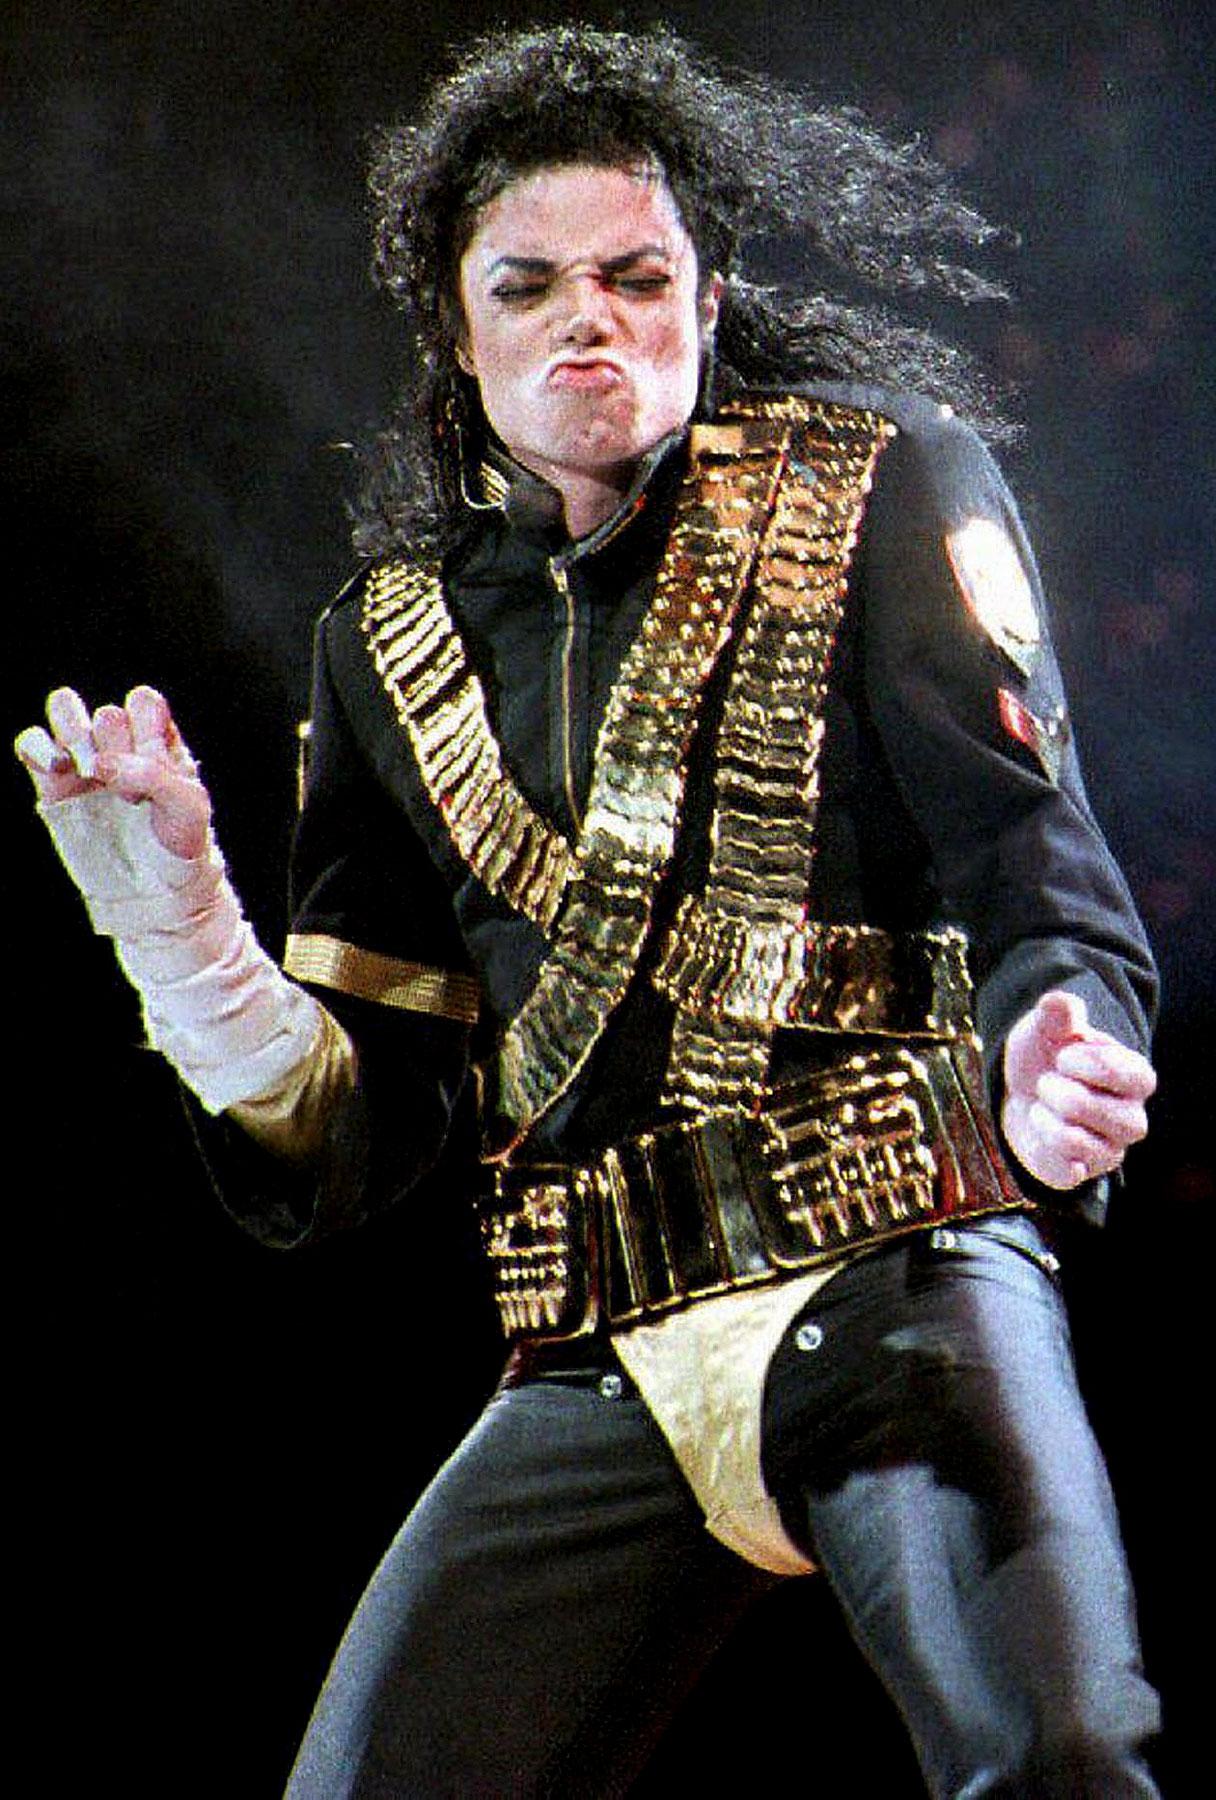 PHOTO GALLERY: Michael Jackson's Most Memorable Performances